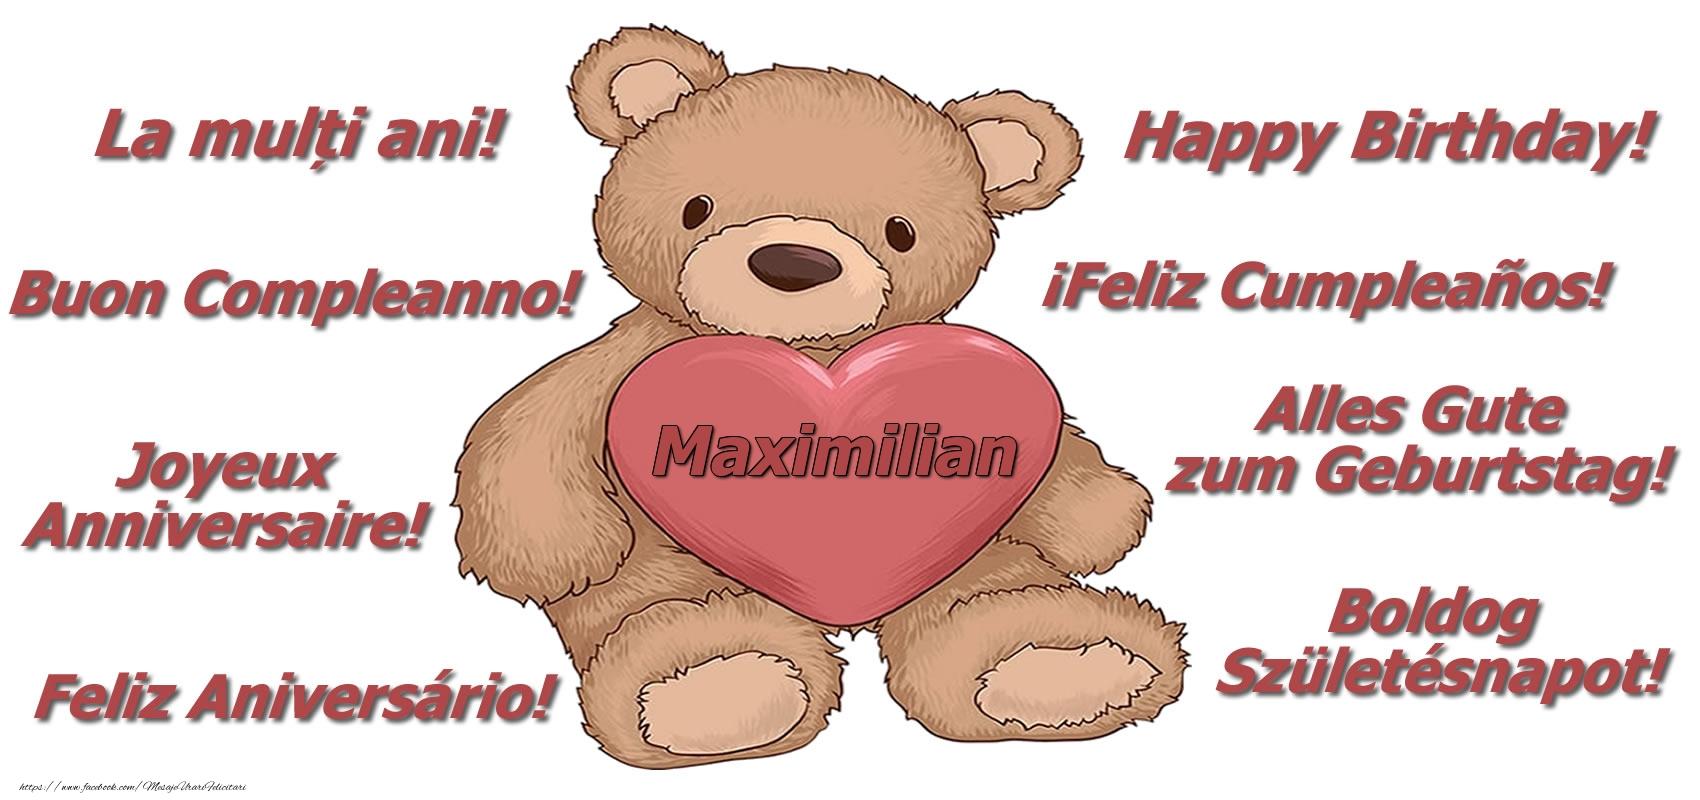 Felicitari de zi de nastere - La multi ani Maximilian! - Ursulet